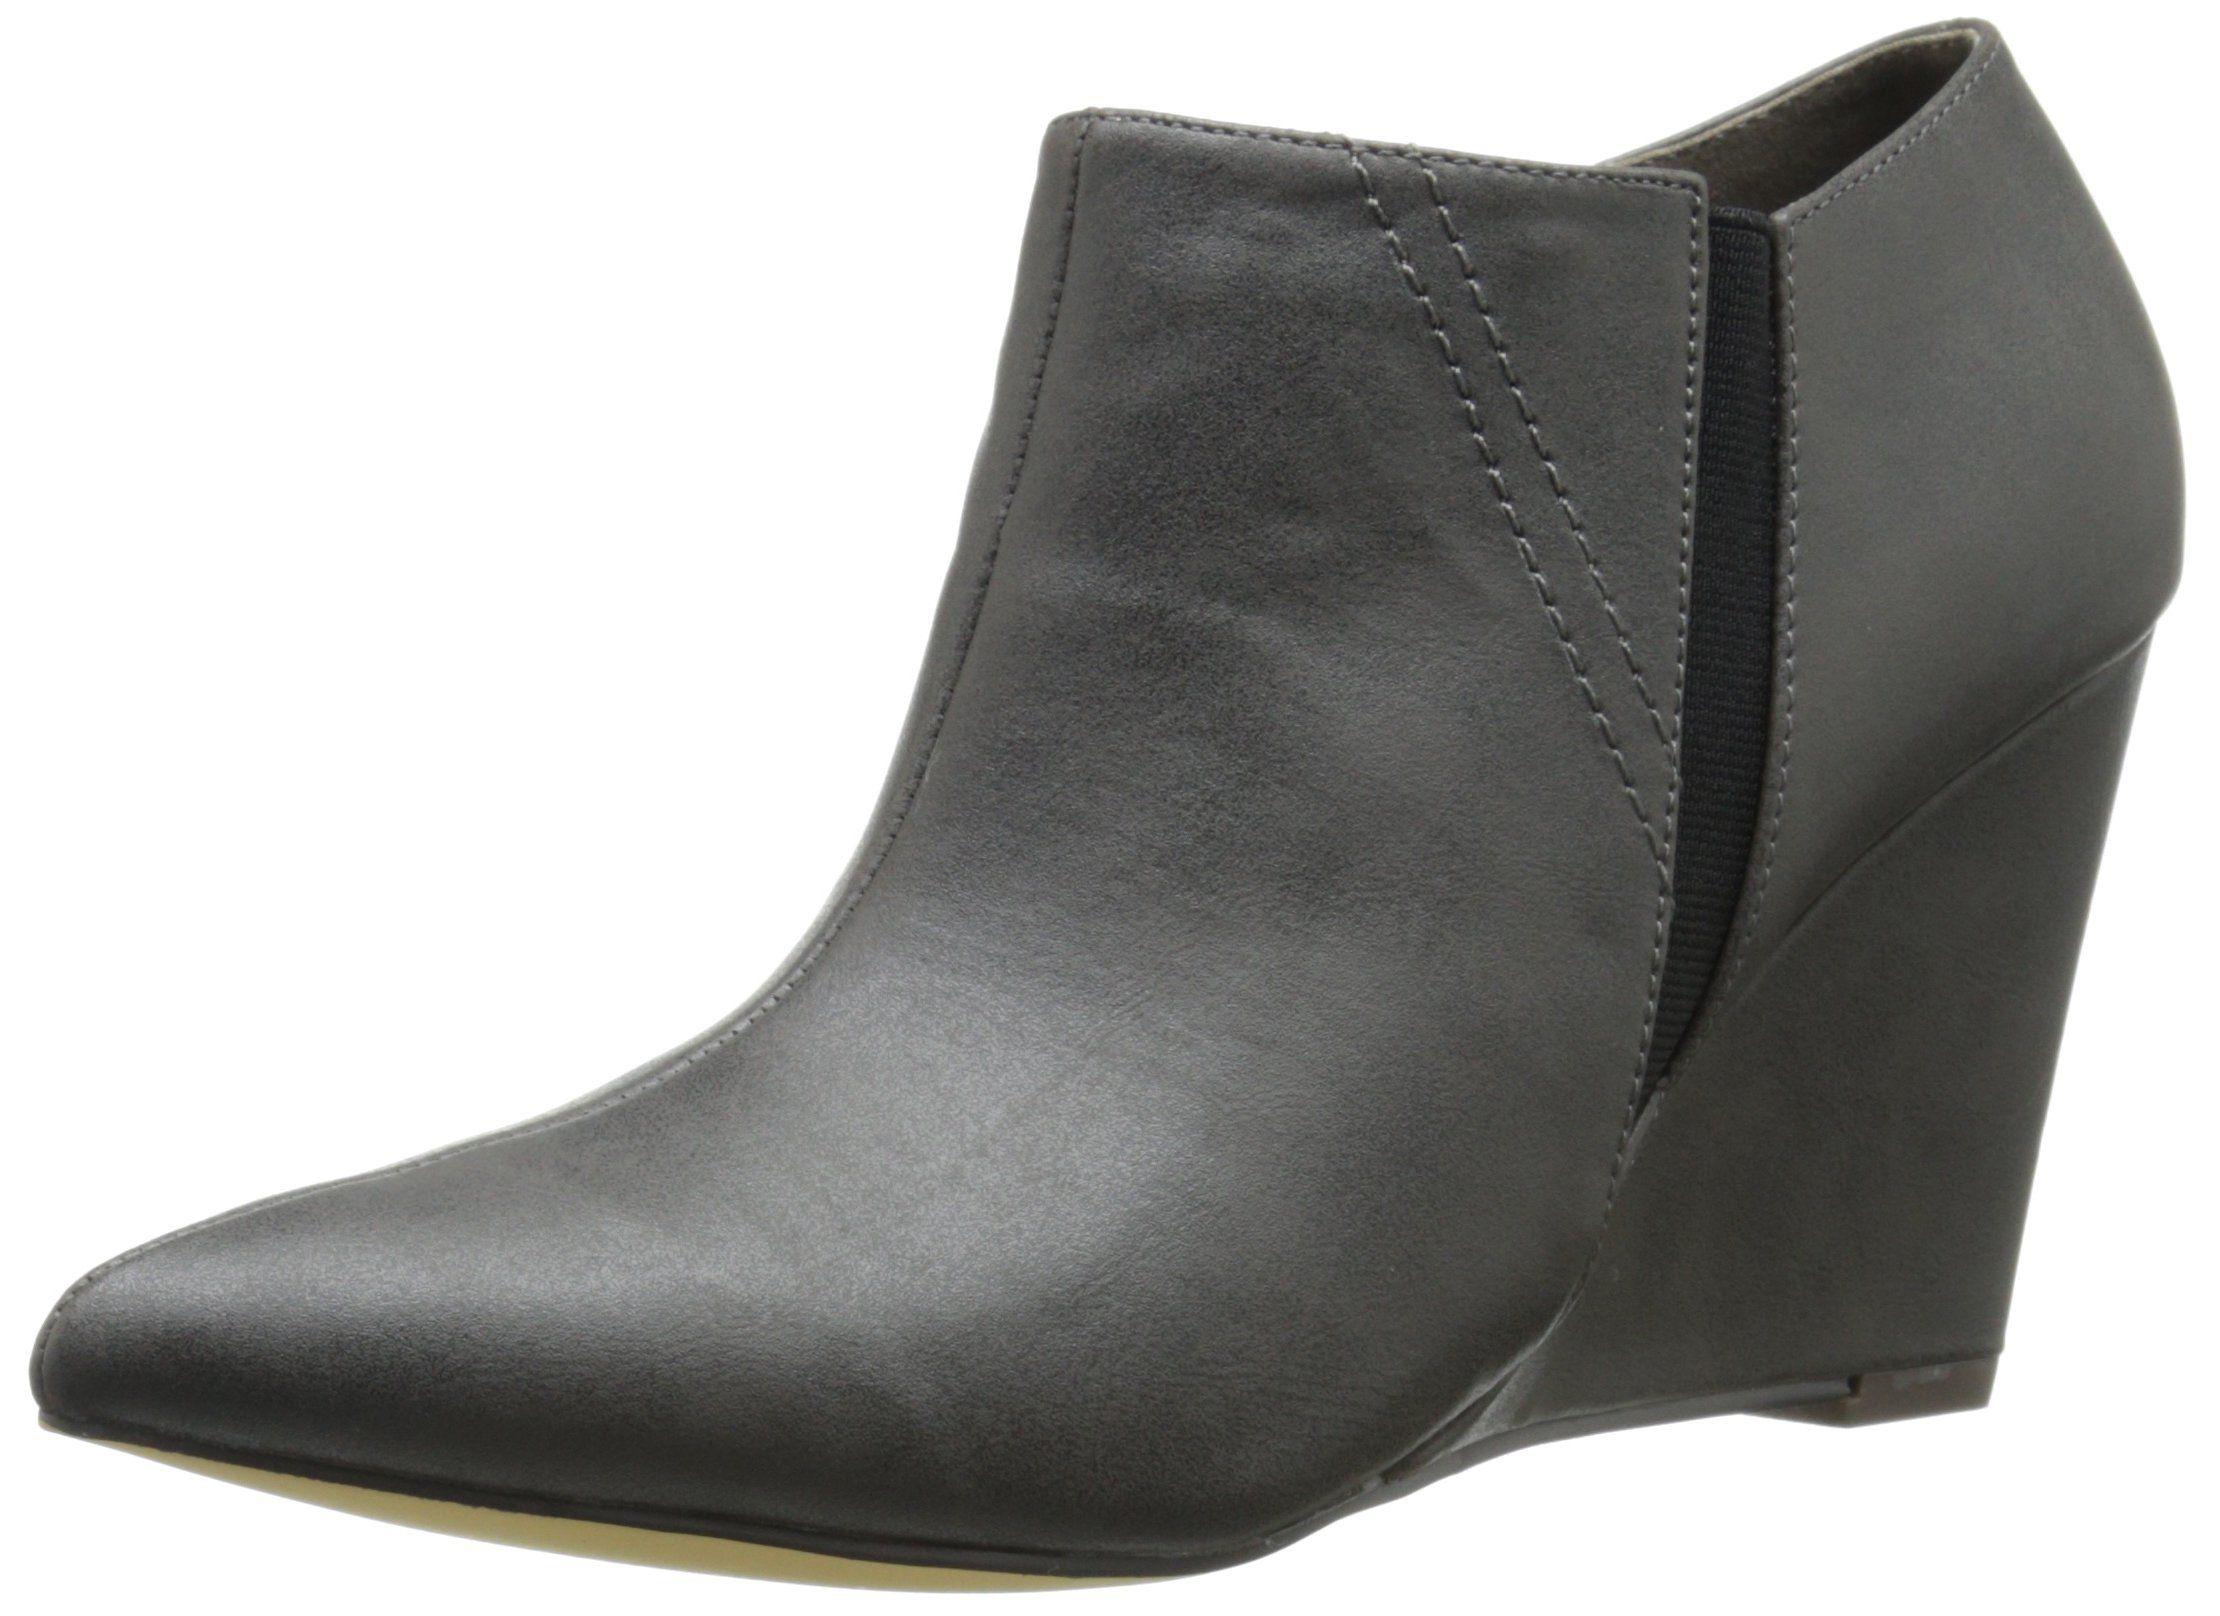 Amazon.com: Michael Antonio Women's Alvynn Boot: Clothing